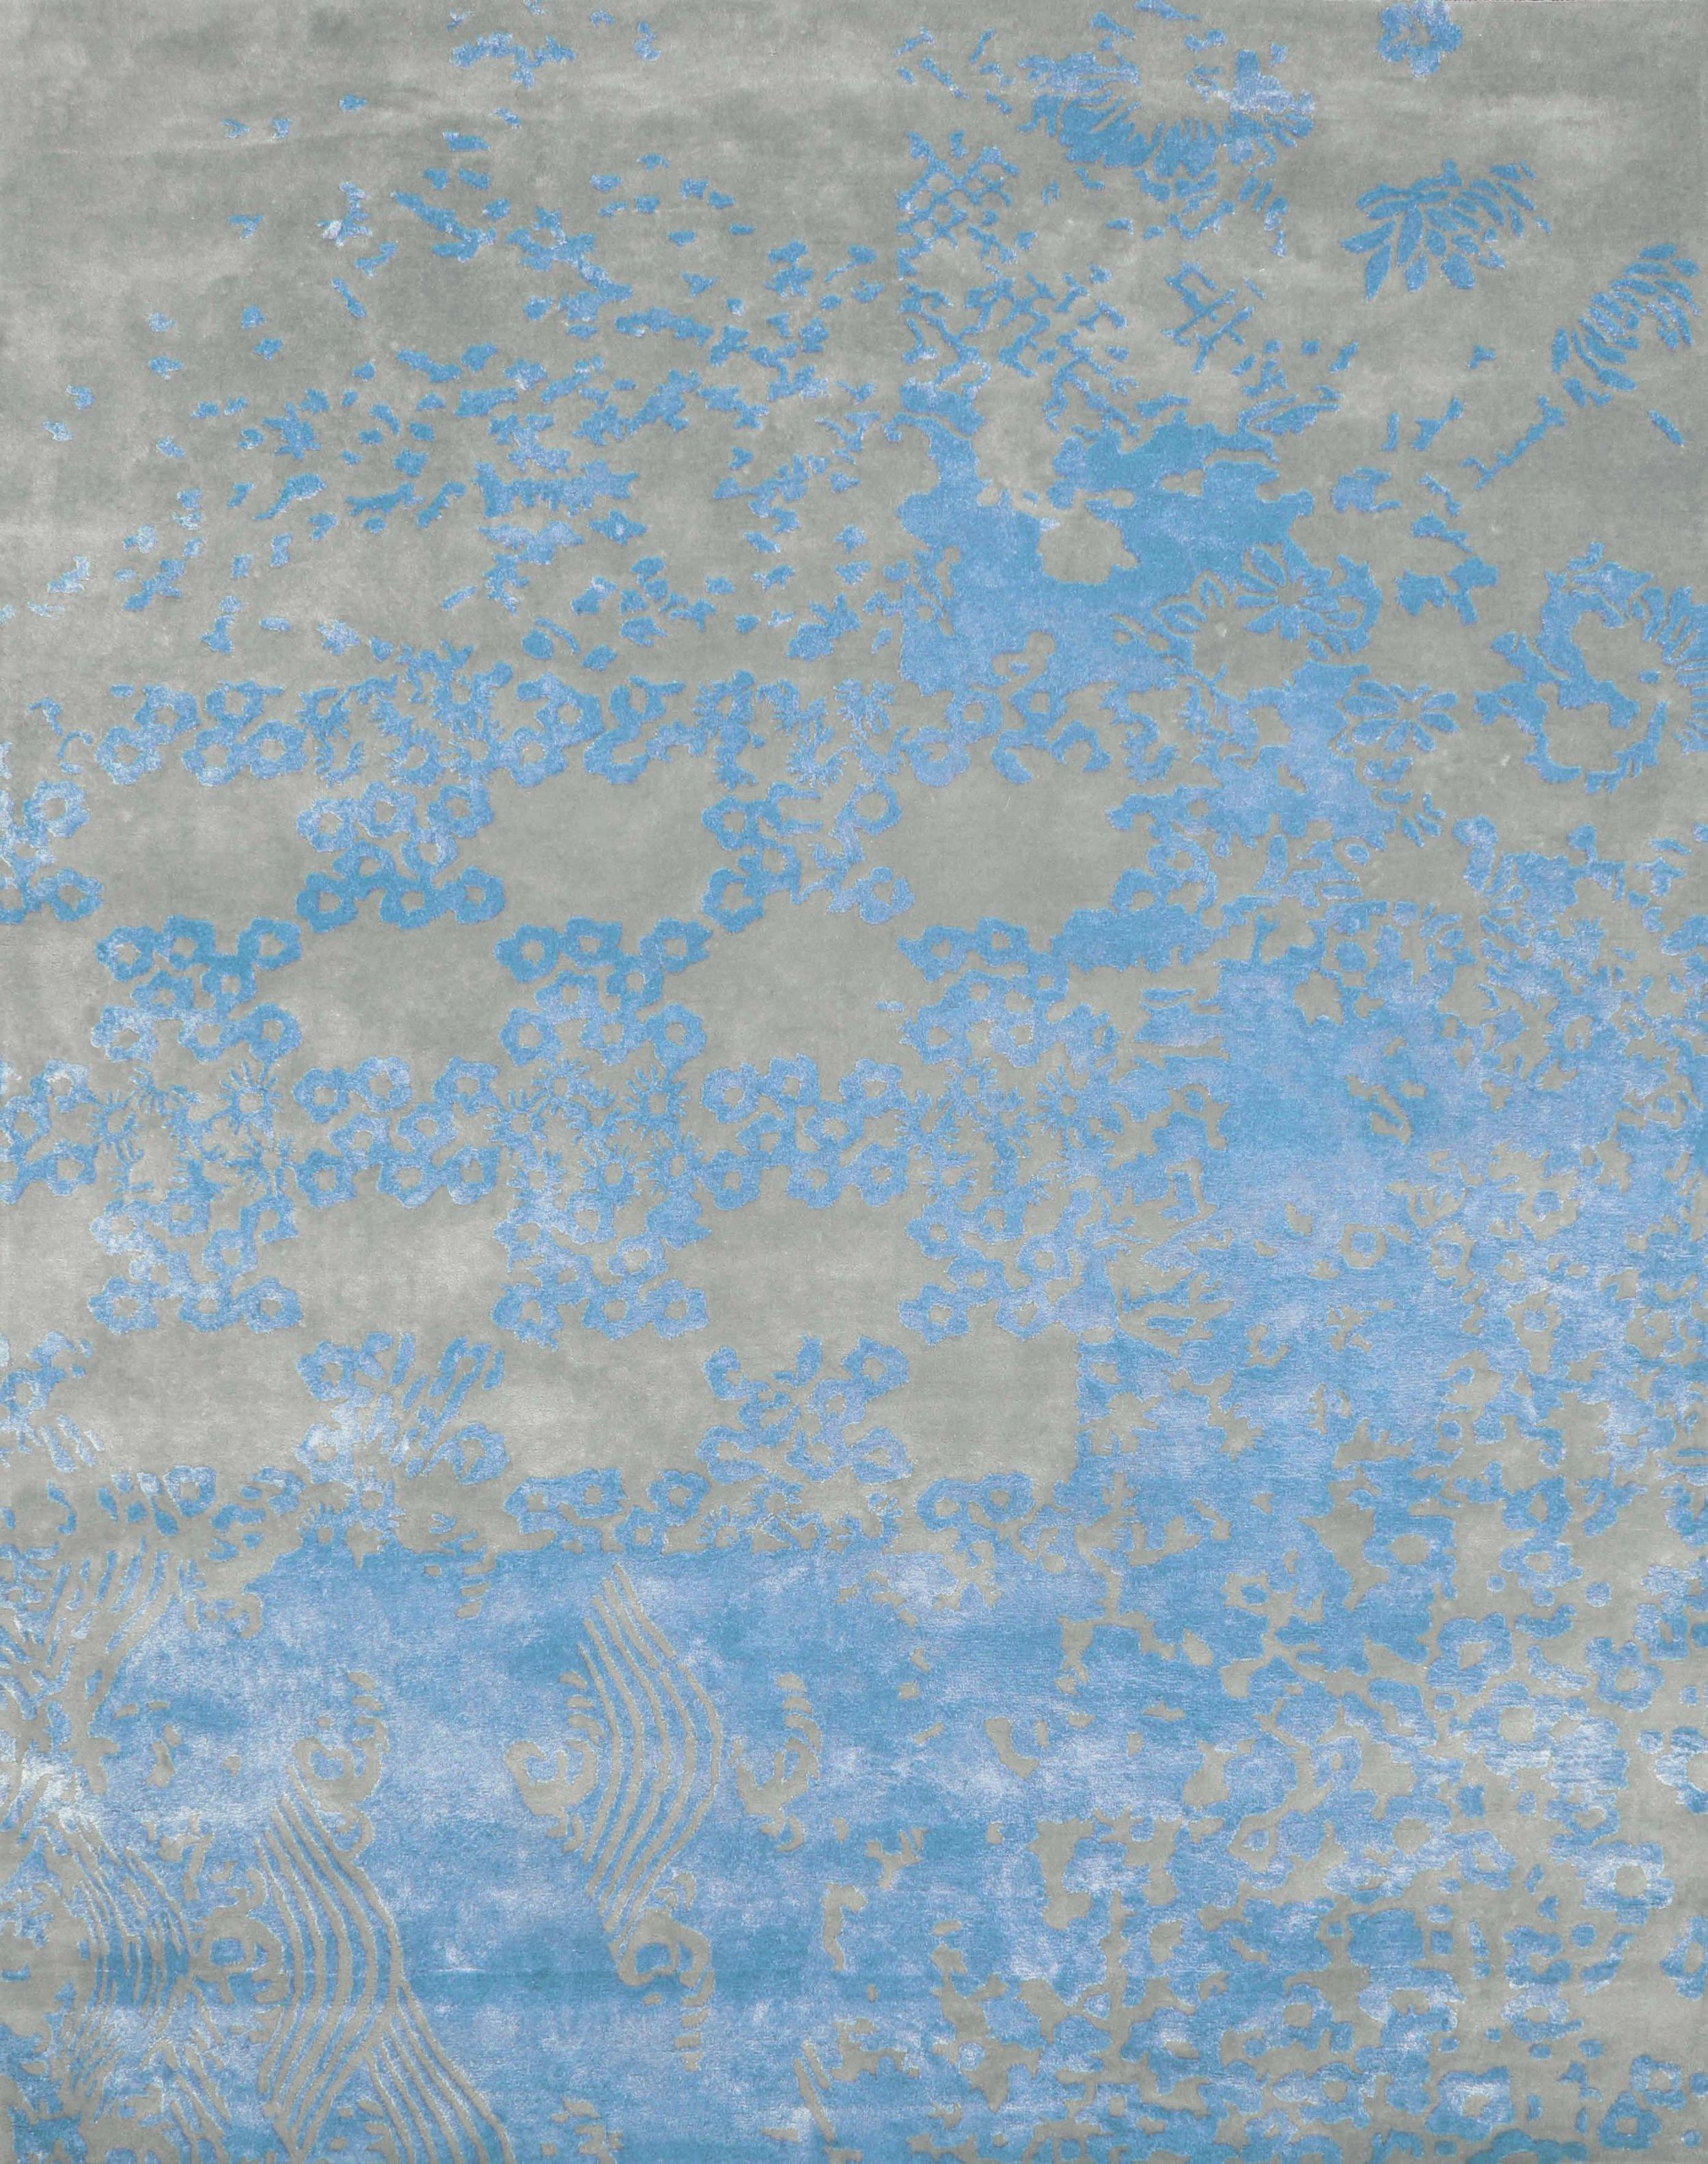 LILY LIGHT BLUE  cod. 008 91